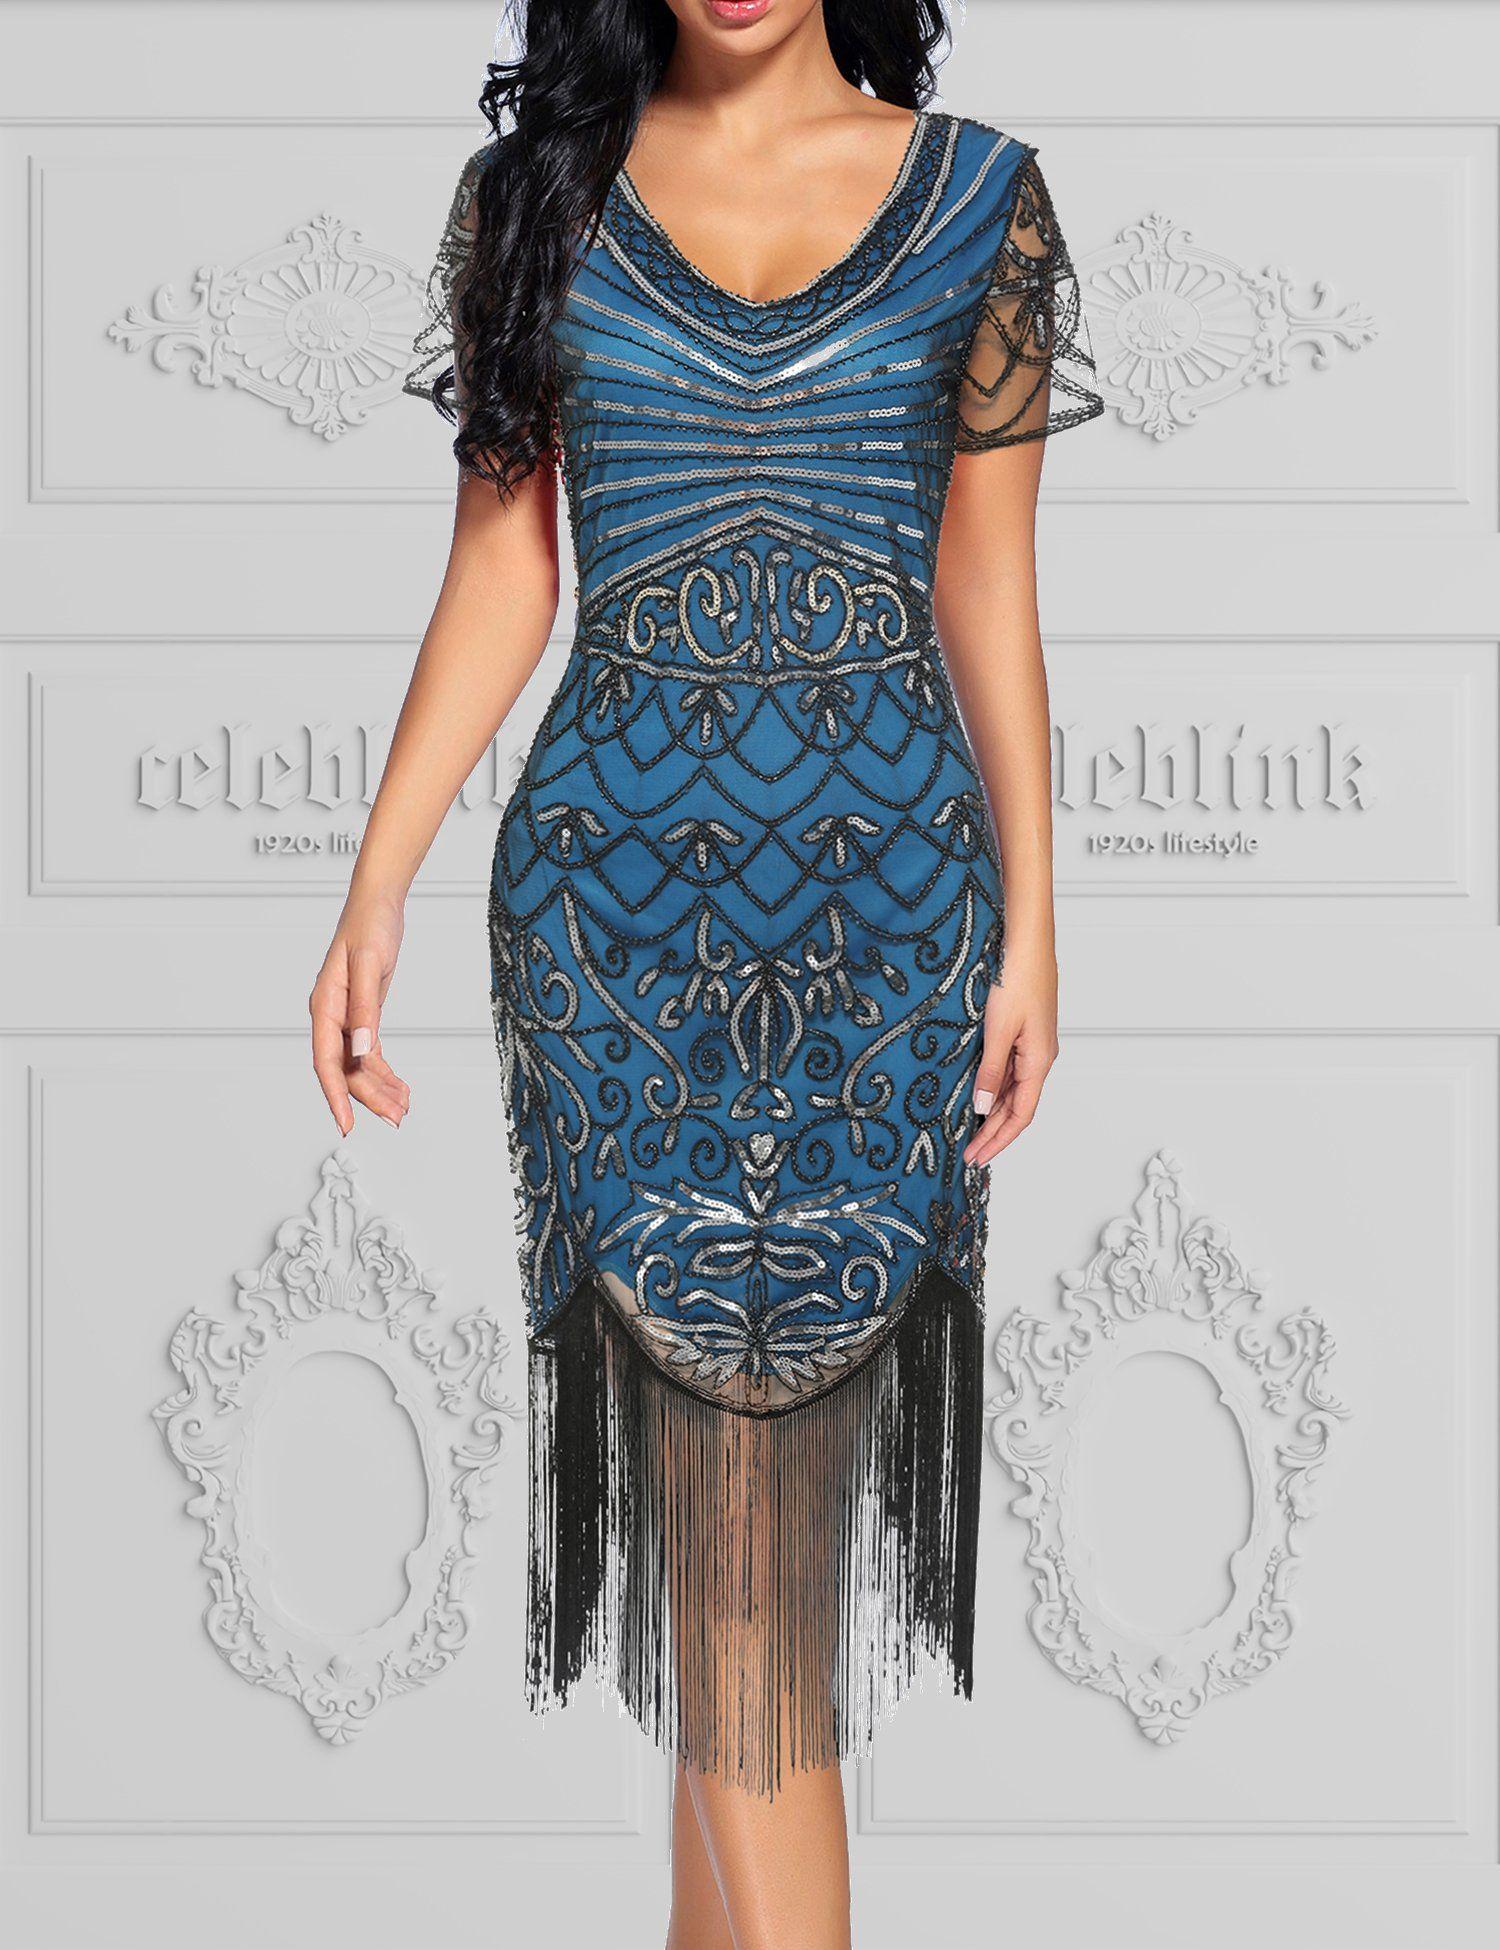 Grand Entrance Gold Glitter Fringe Long Sleeve Mini Dress Party Dress Long Sleeve Mini Dress Dresses [ 1000 x 1000 Pixel ]